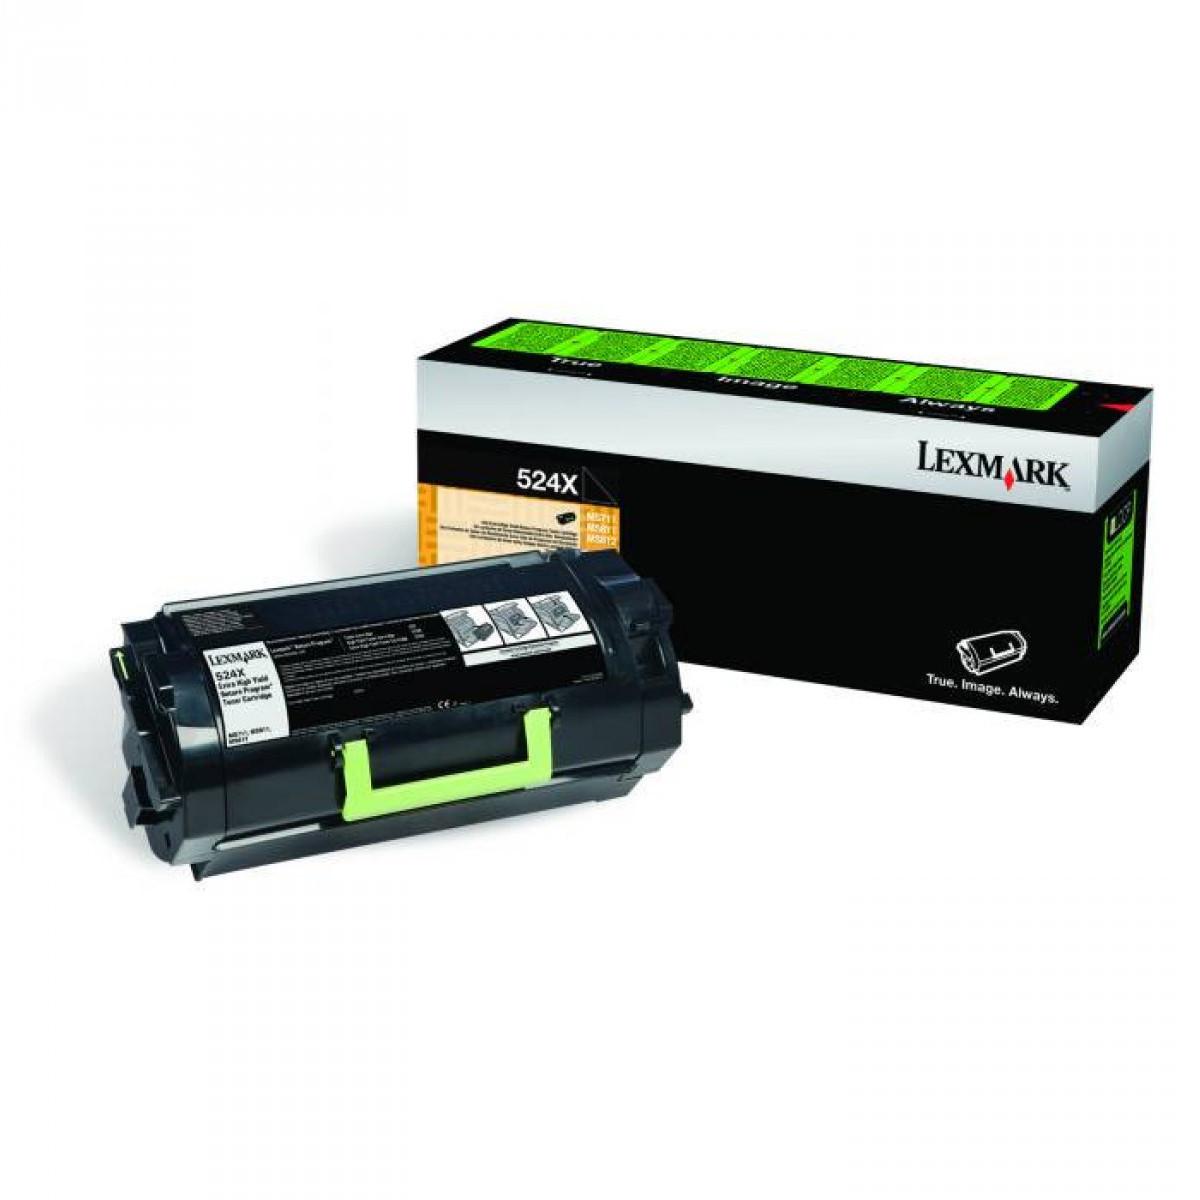 Toner Lexmark 52DBX00 524X | MS811dn MS812dn MS812de | Original 45k